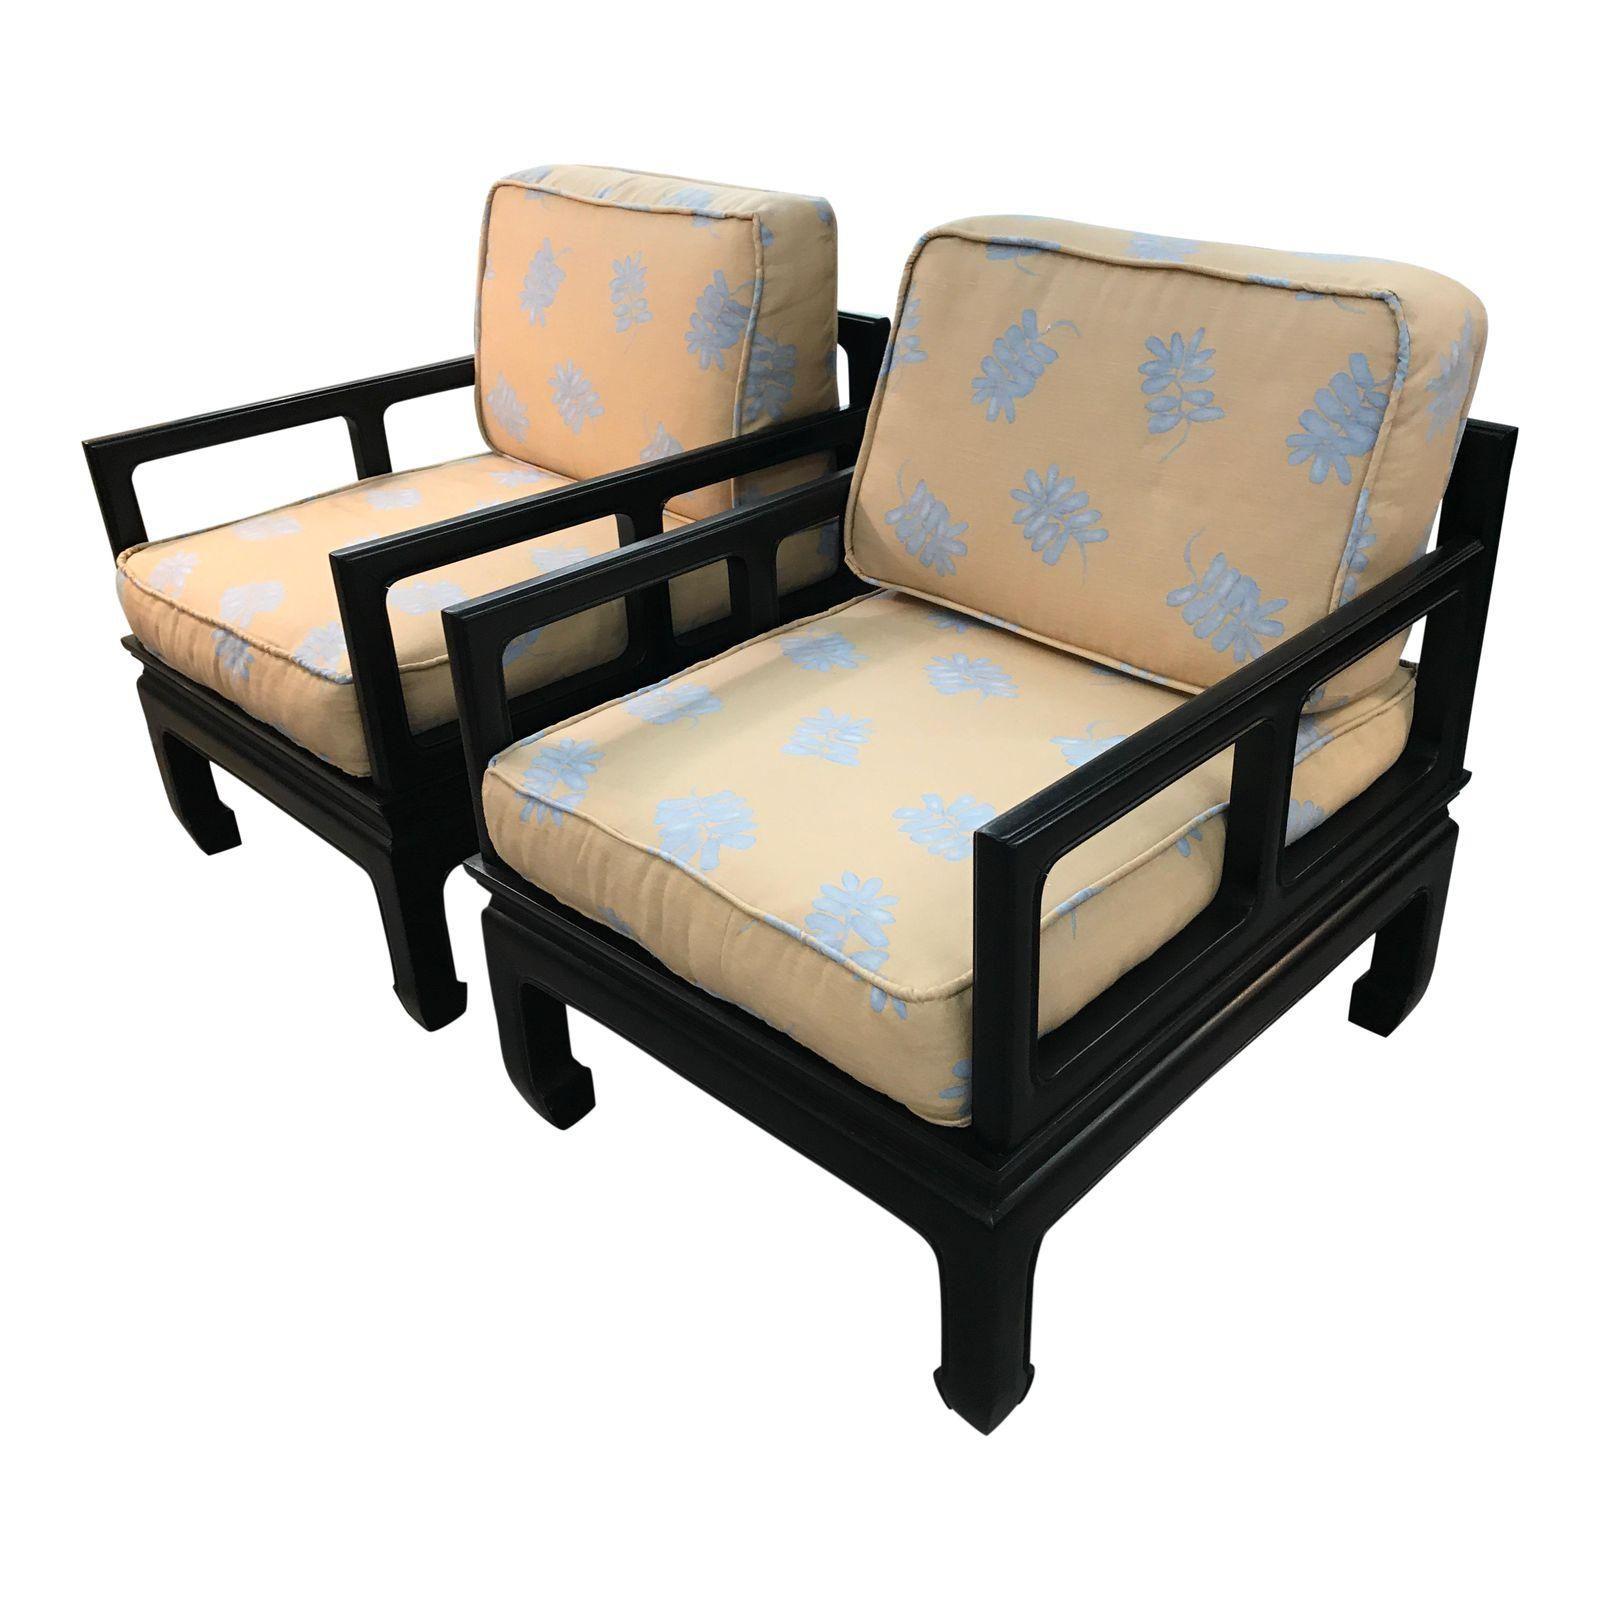 Astonishing Vintage Royal Cathay Asian Chairs A Pair On Chairish Creativecarmelina Interior Chair Design Creativecarmelinacom